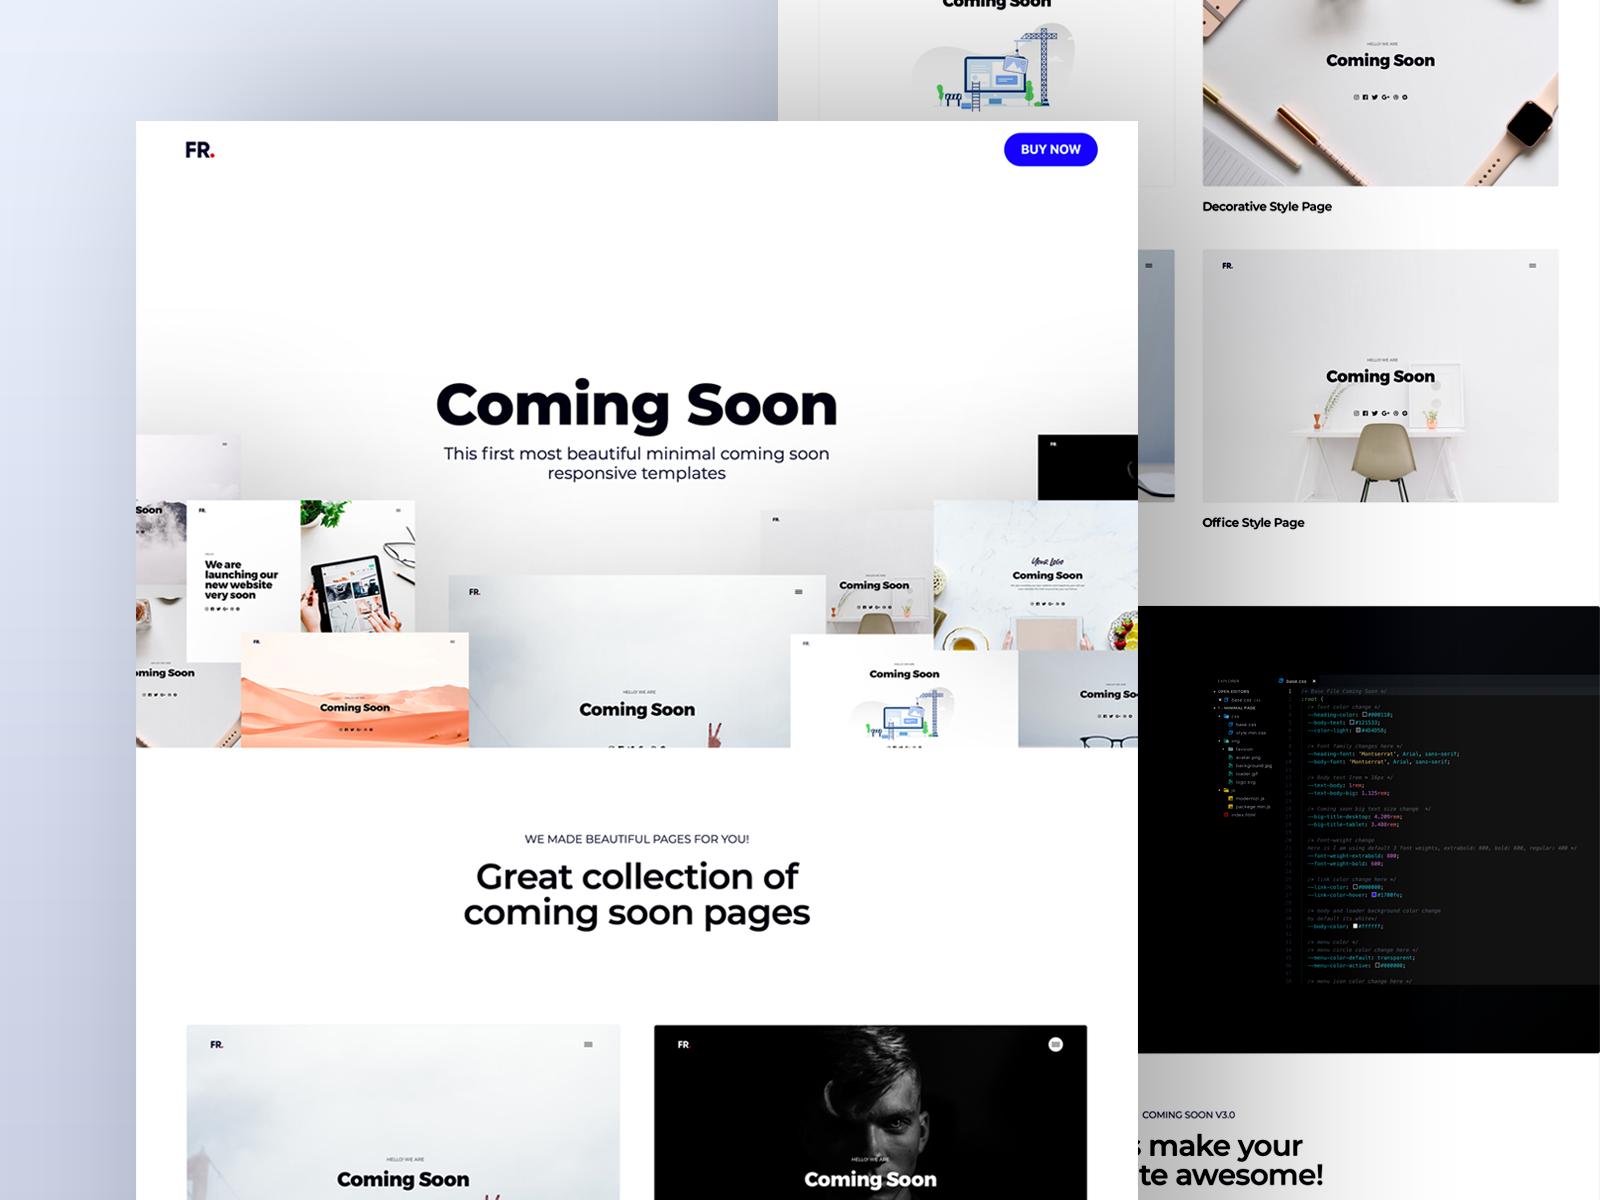 Comingsoon website